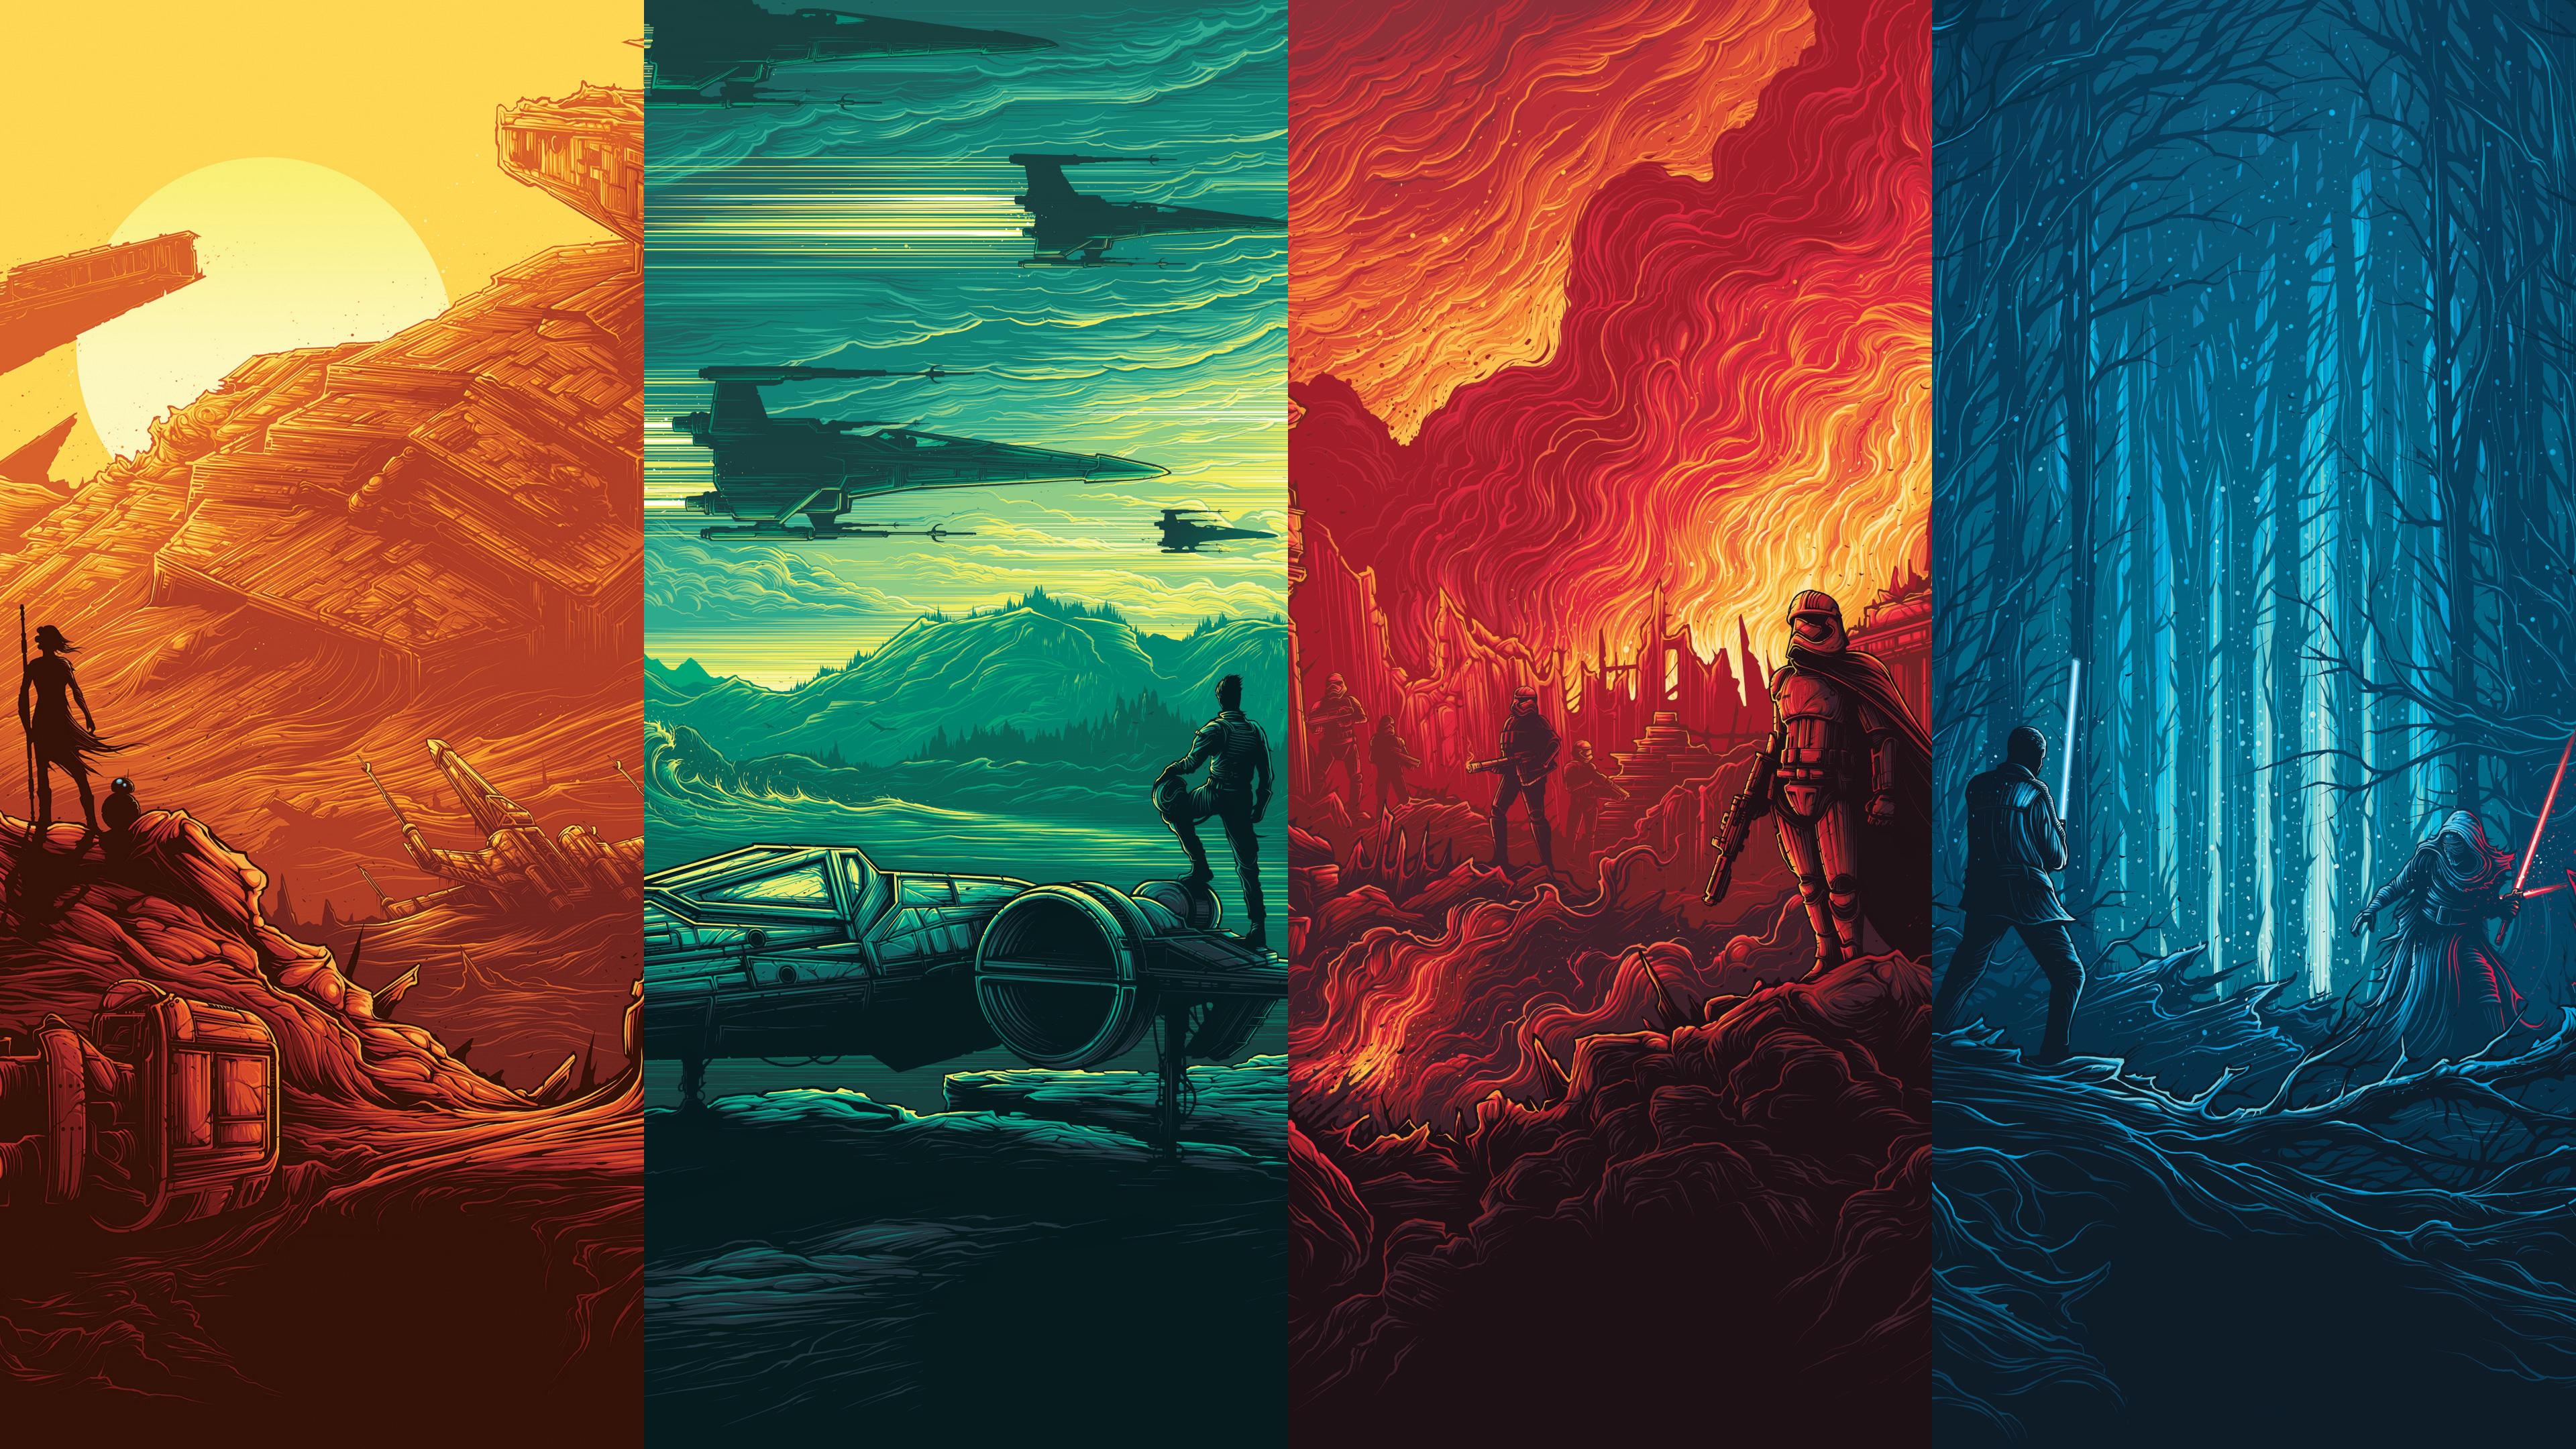 Star Wars Art Ps4wallpapers Com